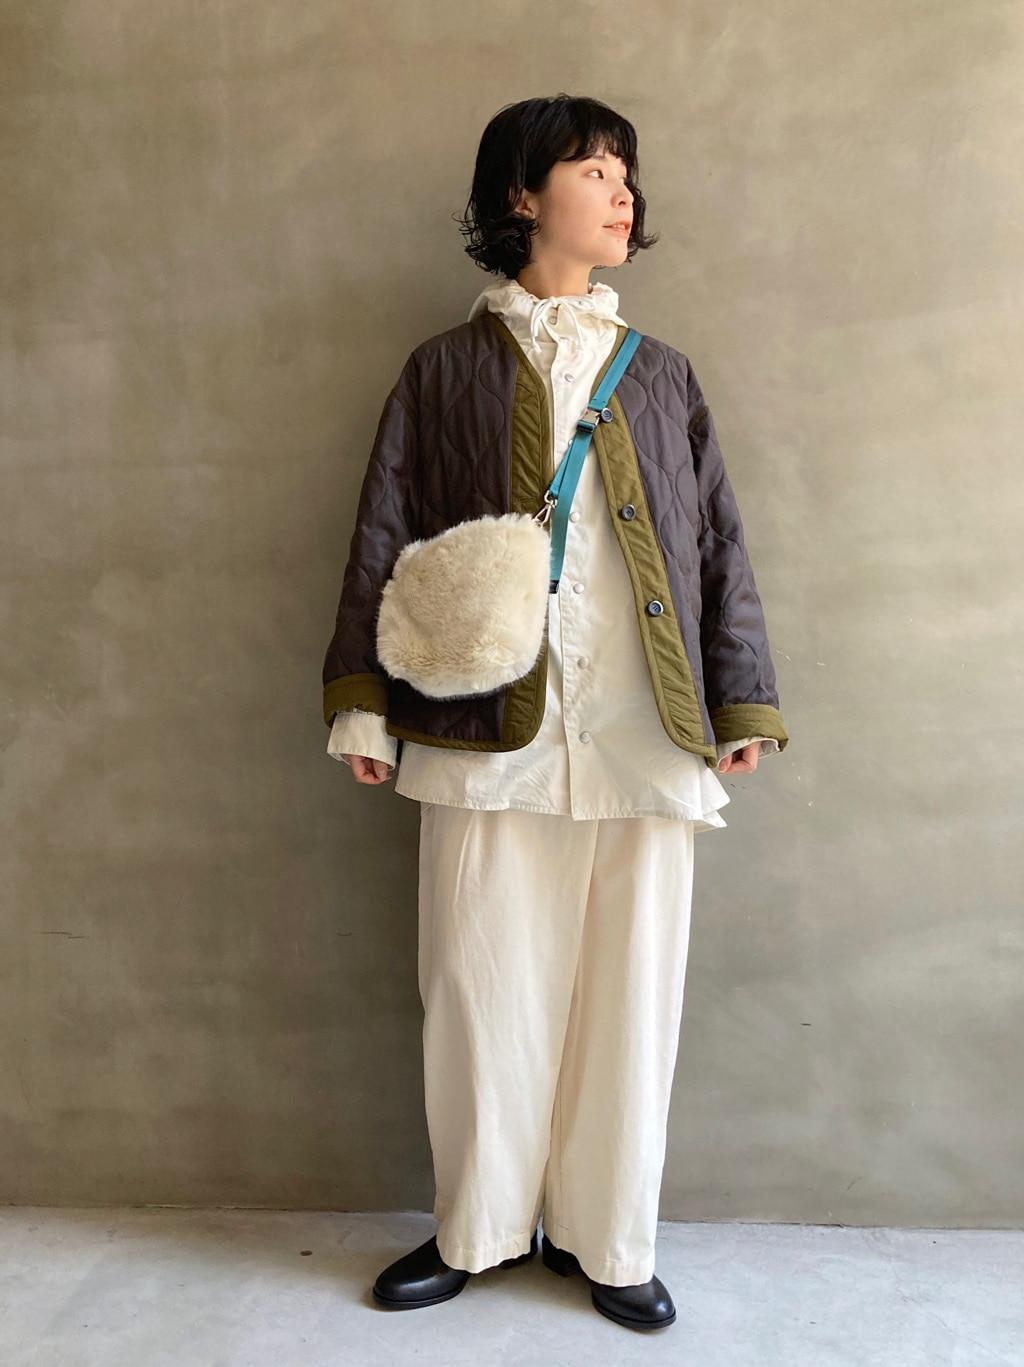 caph troupe 福岡薬院路面 身長:155cm 2020.11.10